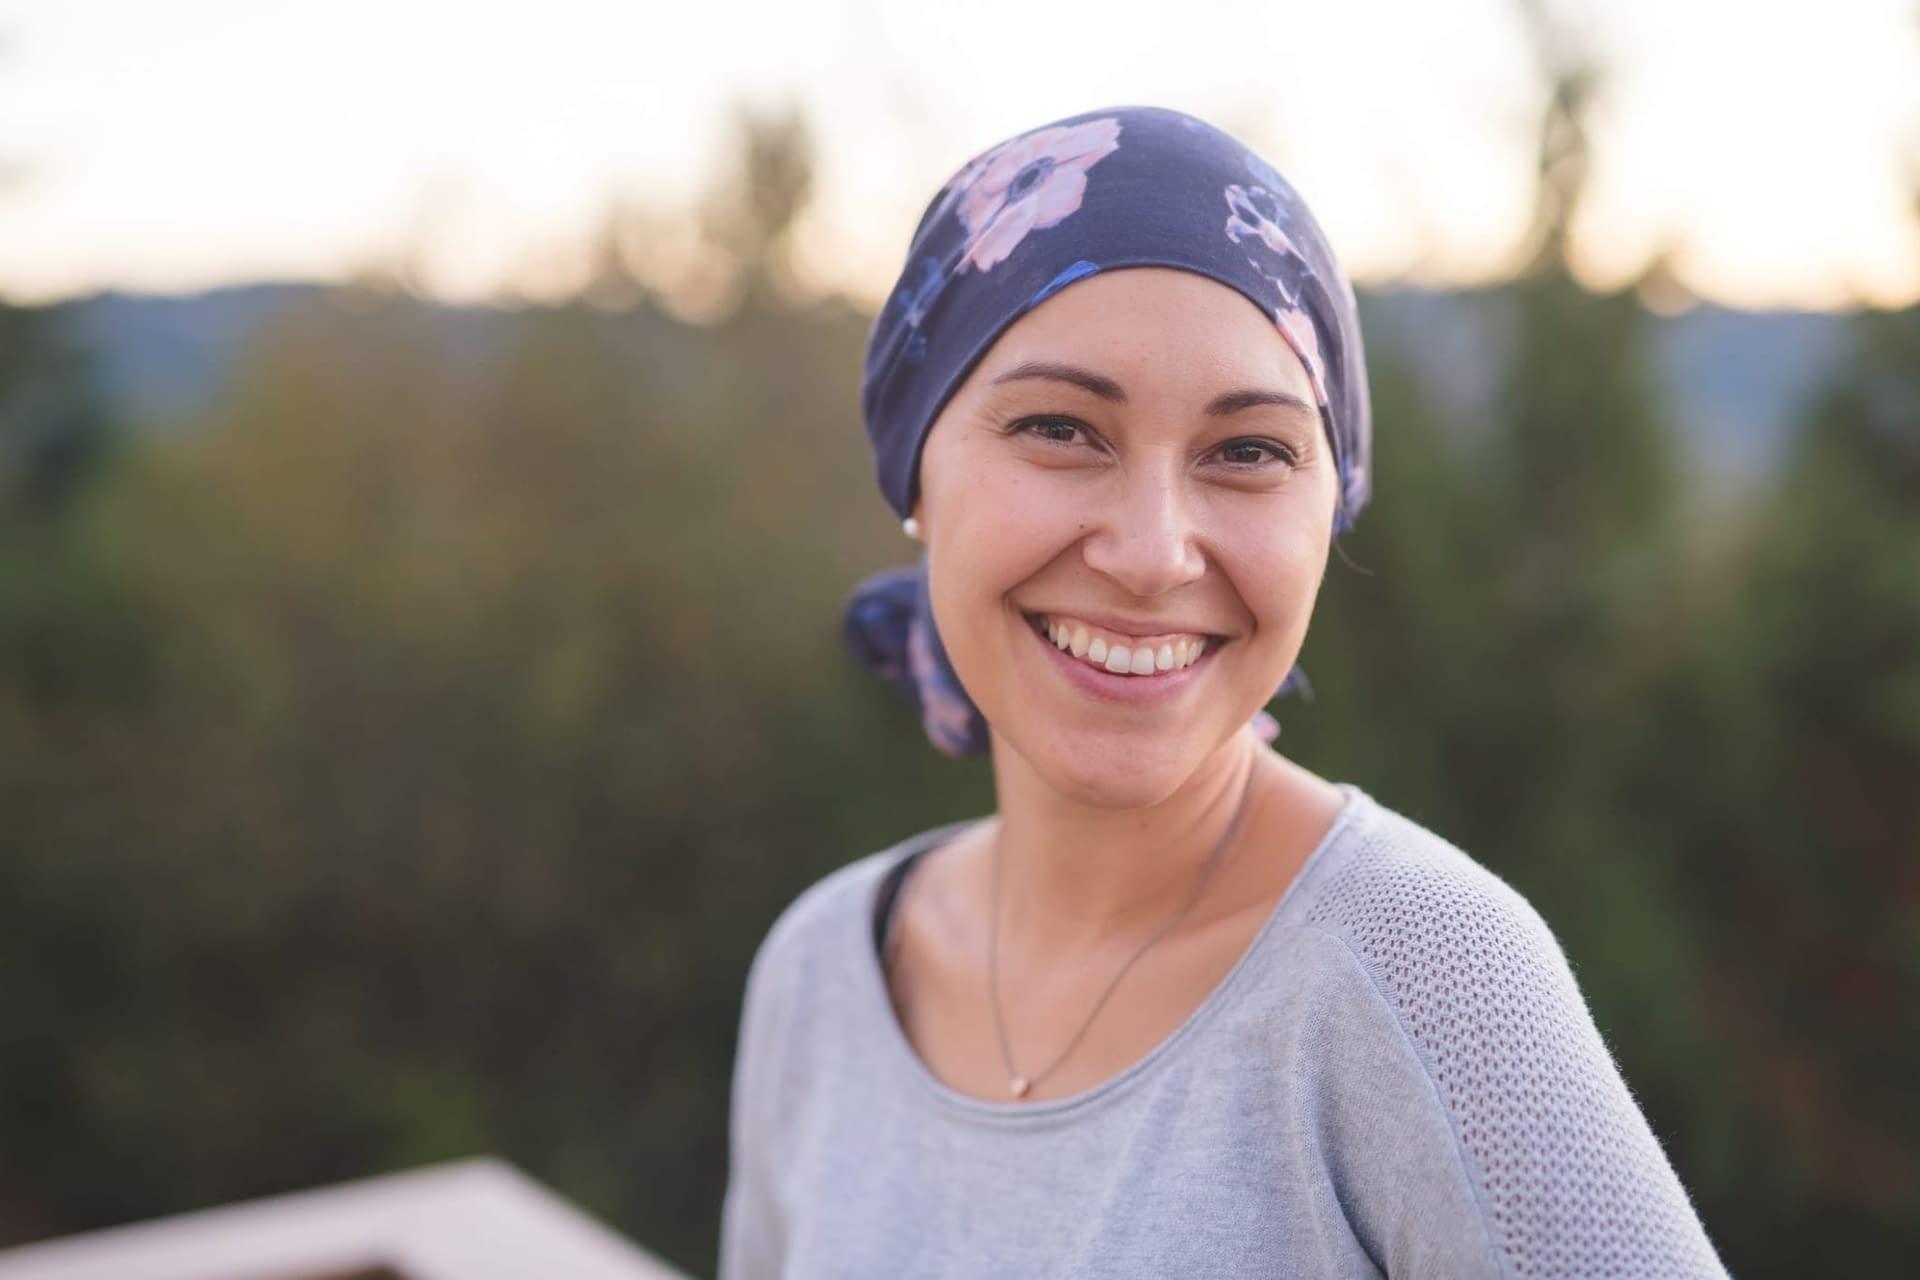 Cancer Patient Smiling